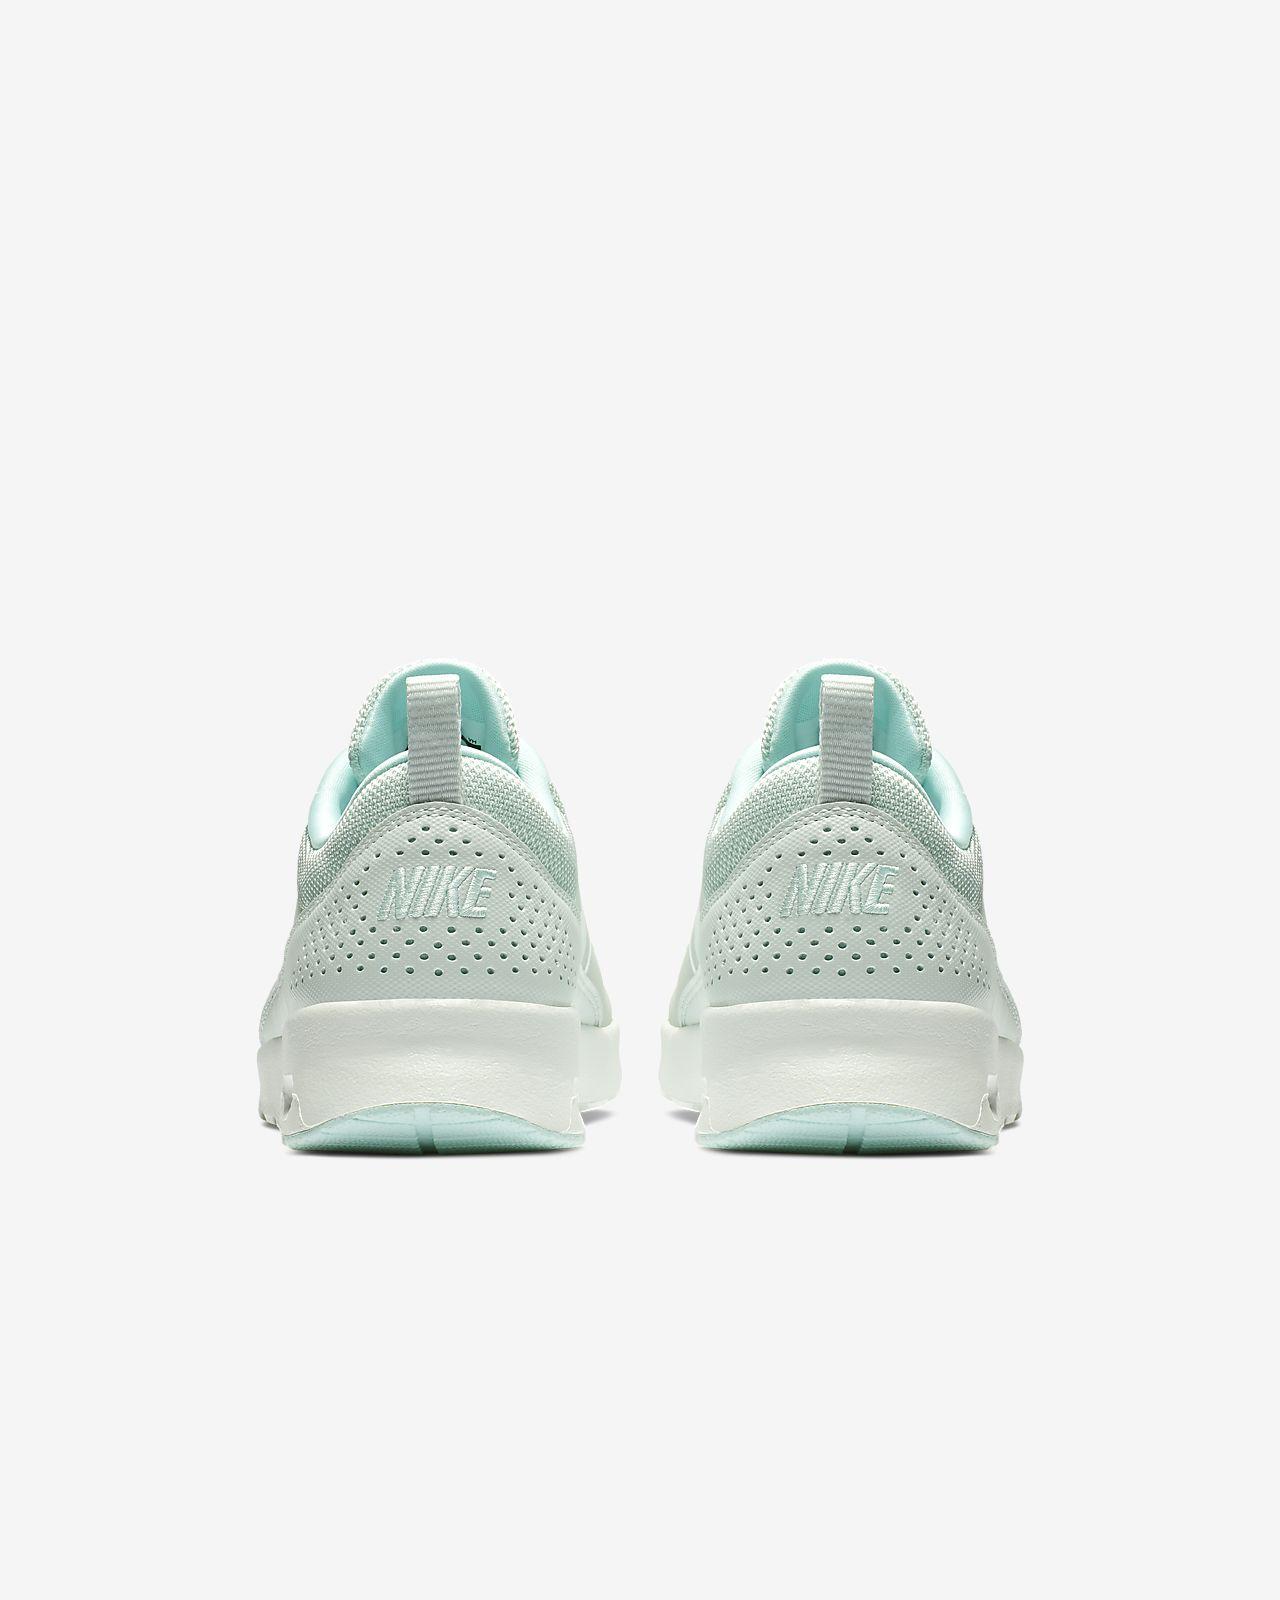 49ce33fa5bf0e1 Nike Air Max Thea Women s Shoe. Nike.com LU